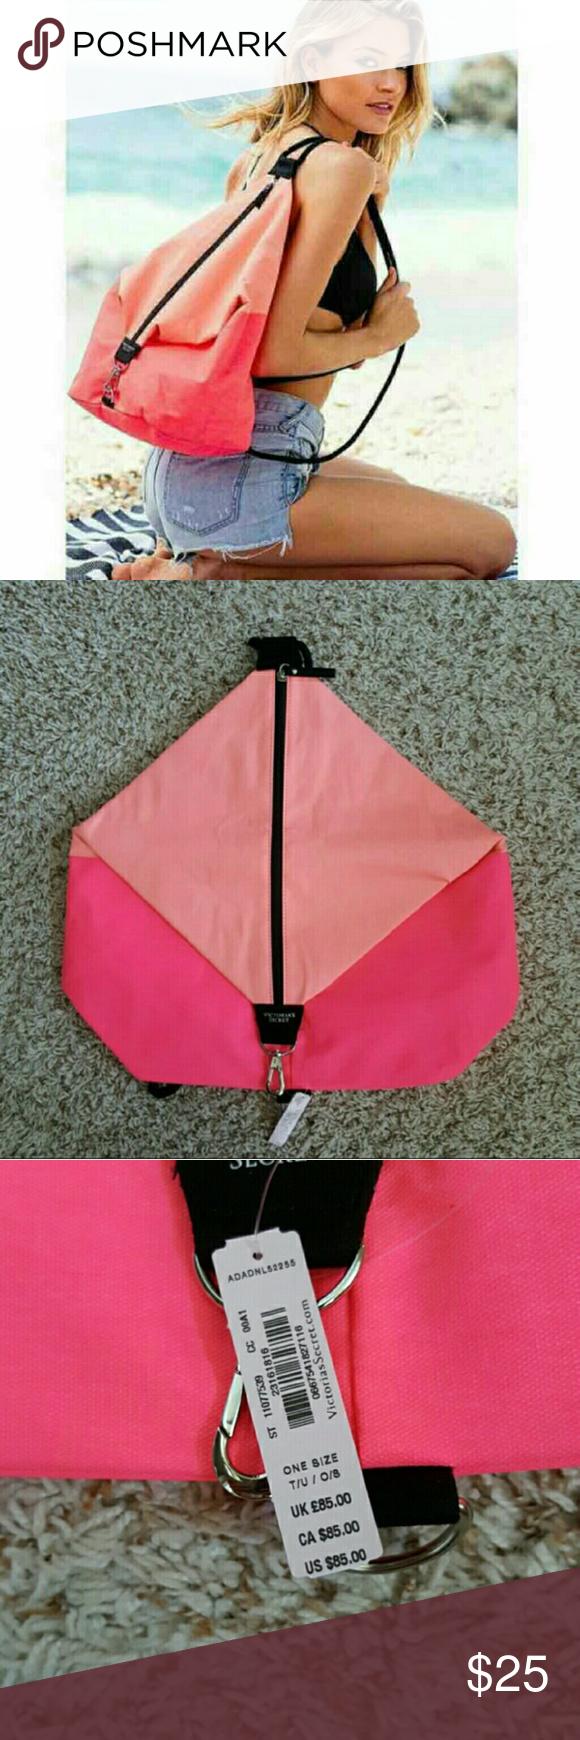 Victoria's secret backpack Victoria's secret backpack, NWT! Victoria's Secret Bags Backpacks